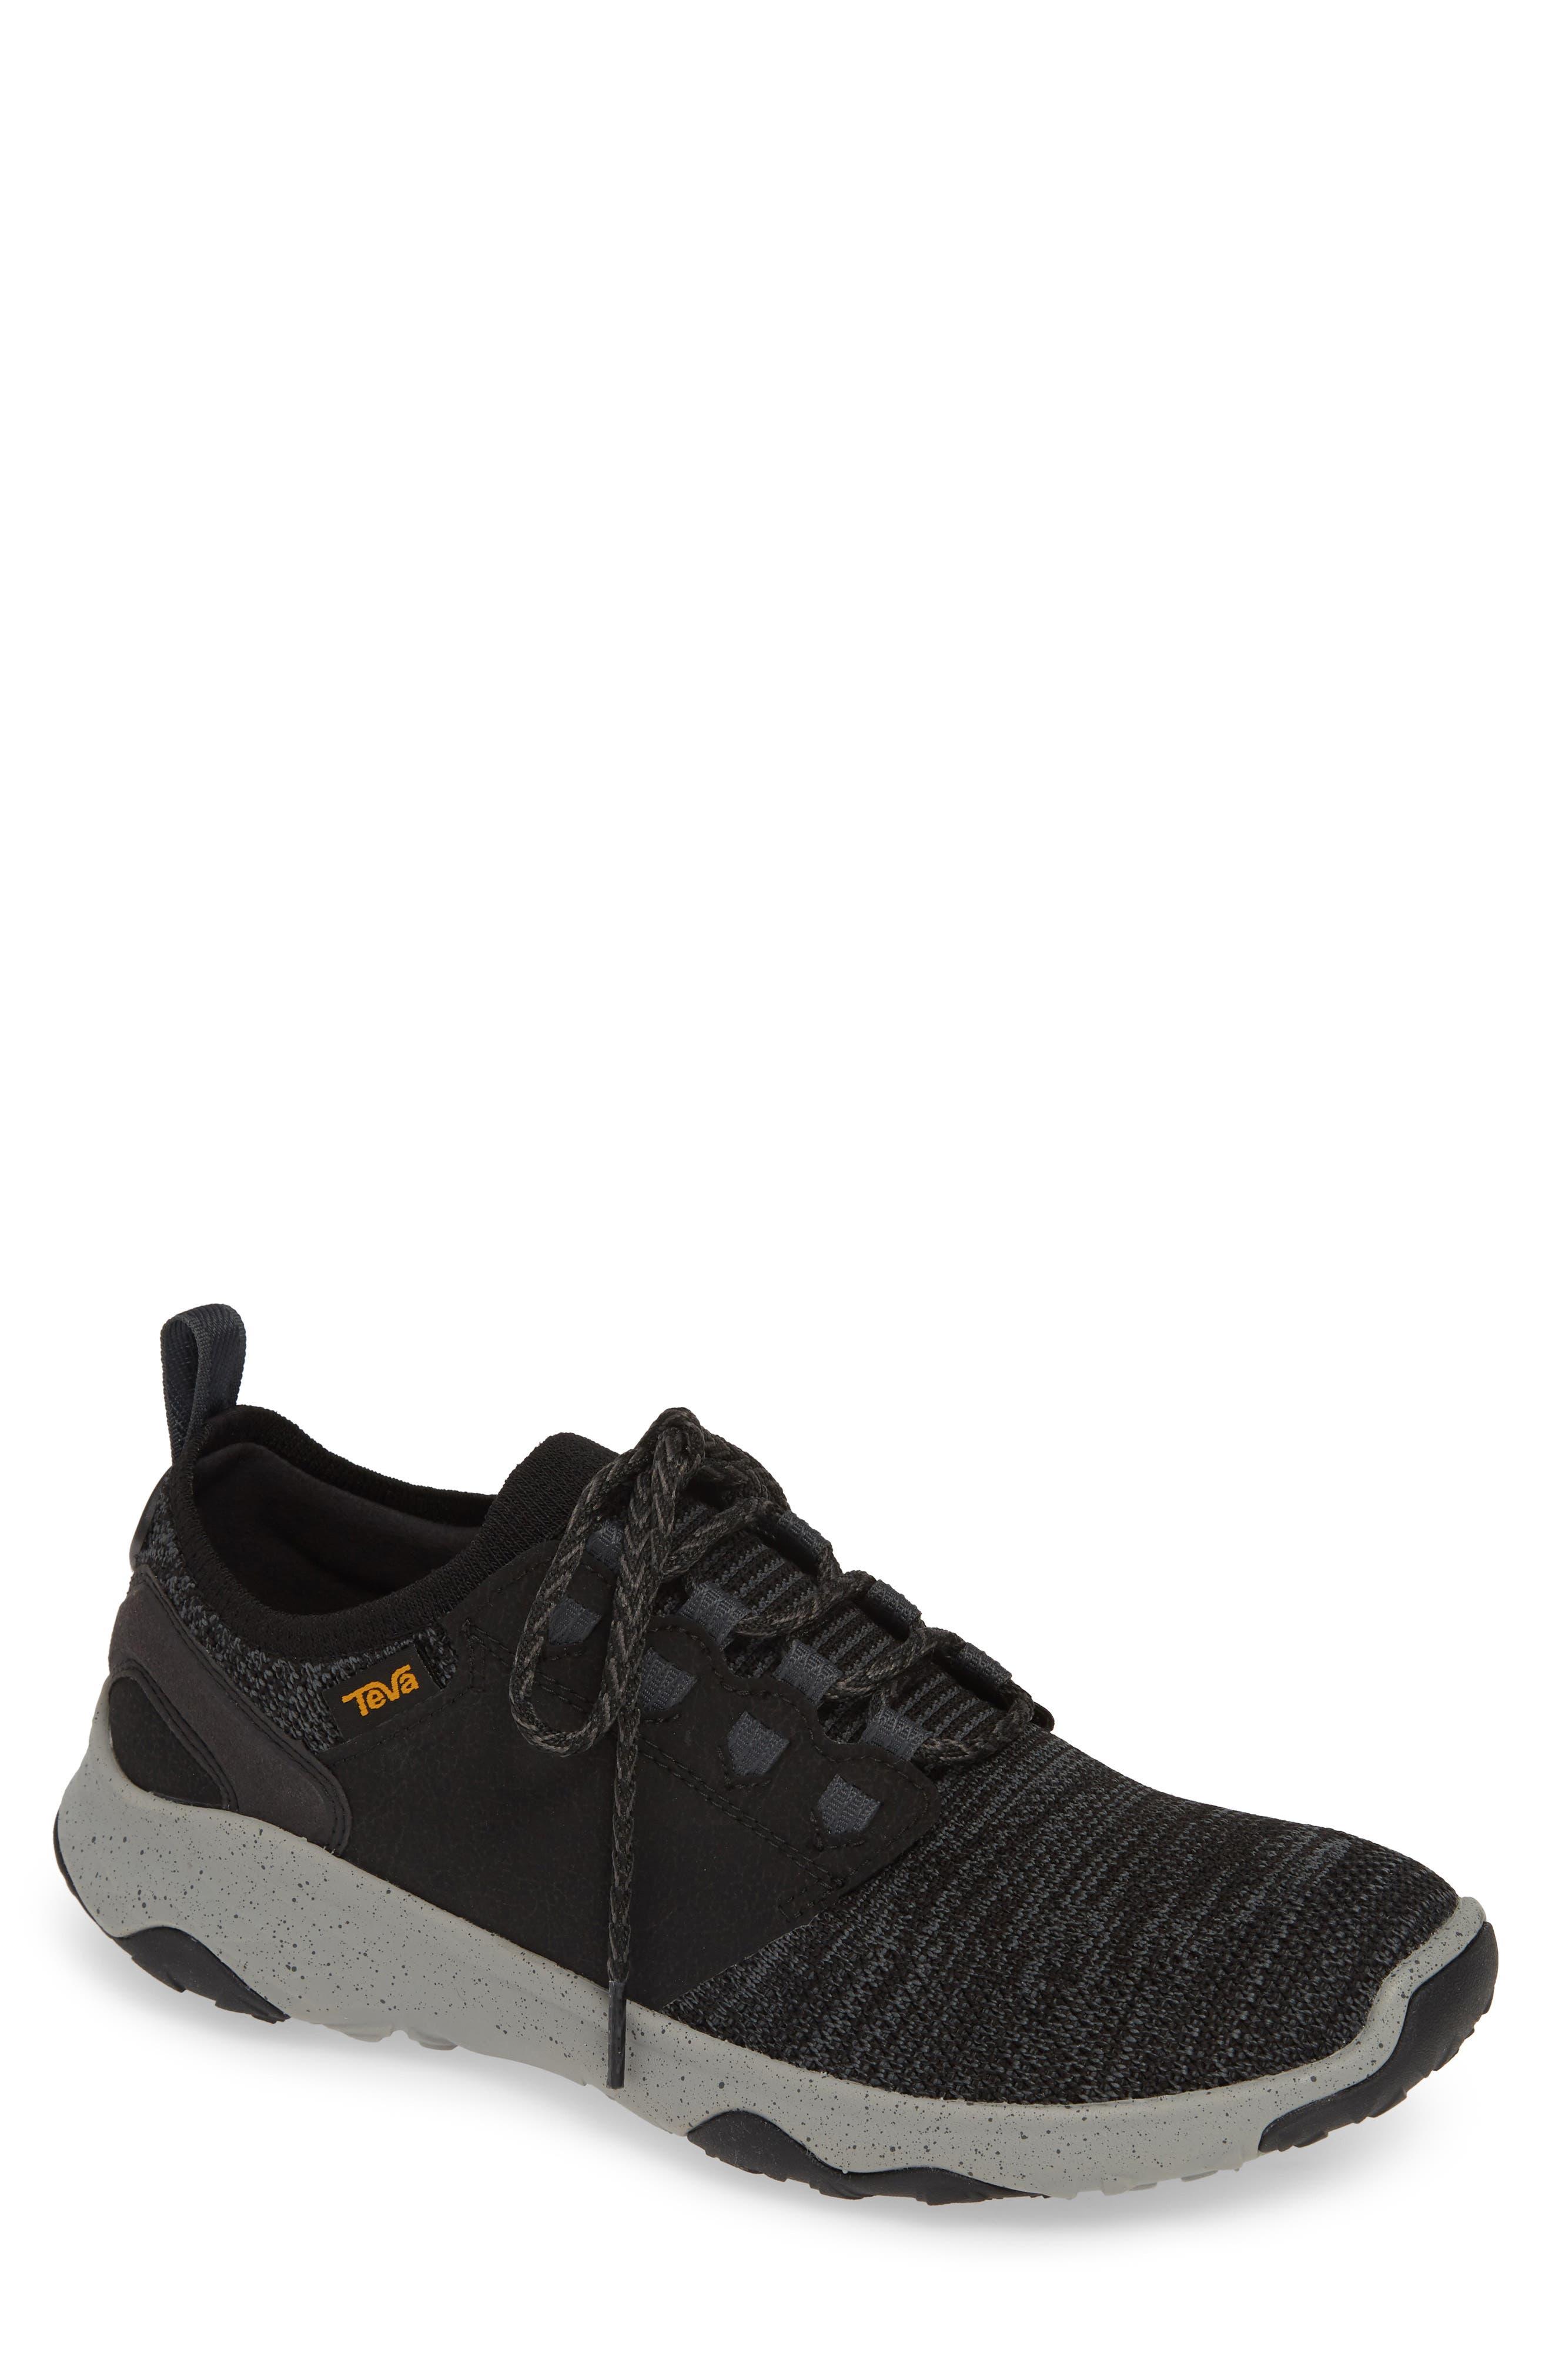 TEVA Arrowood 2 Hiking Shoe, Main, color, BLACK